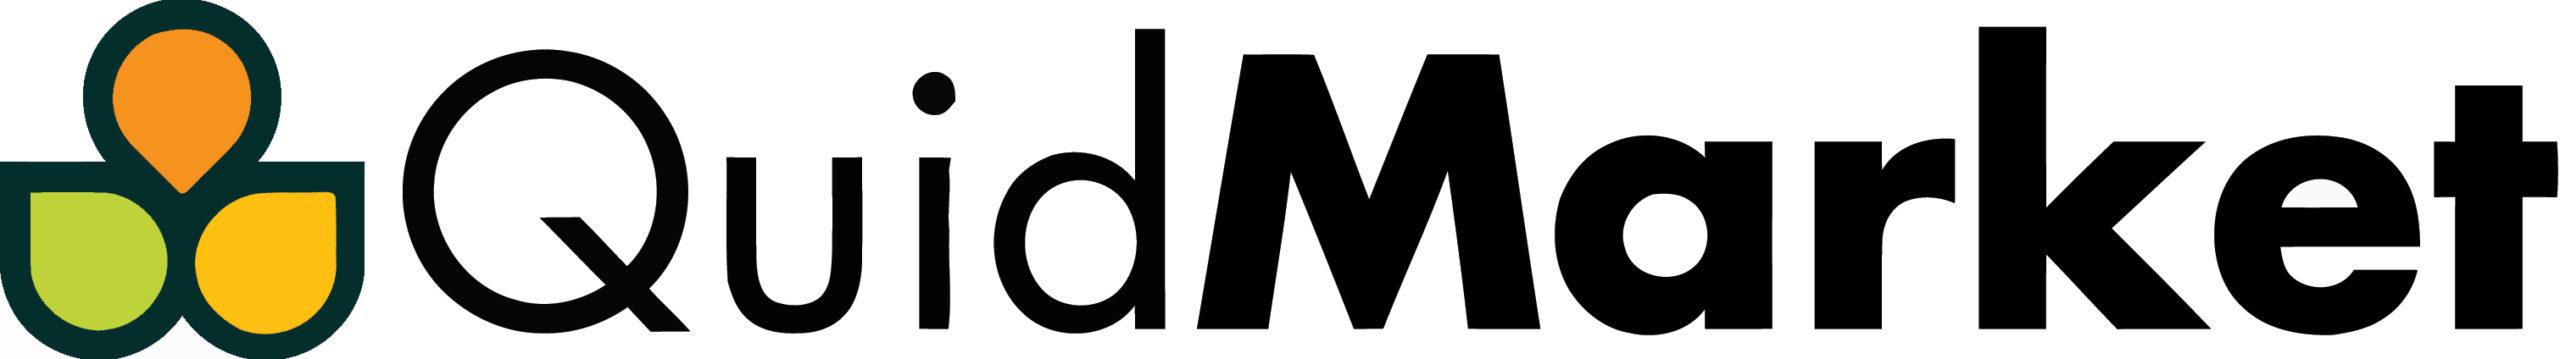 QuidMarket lending company logo